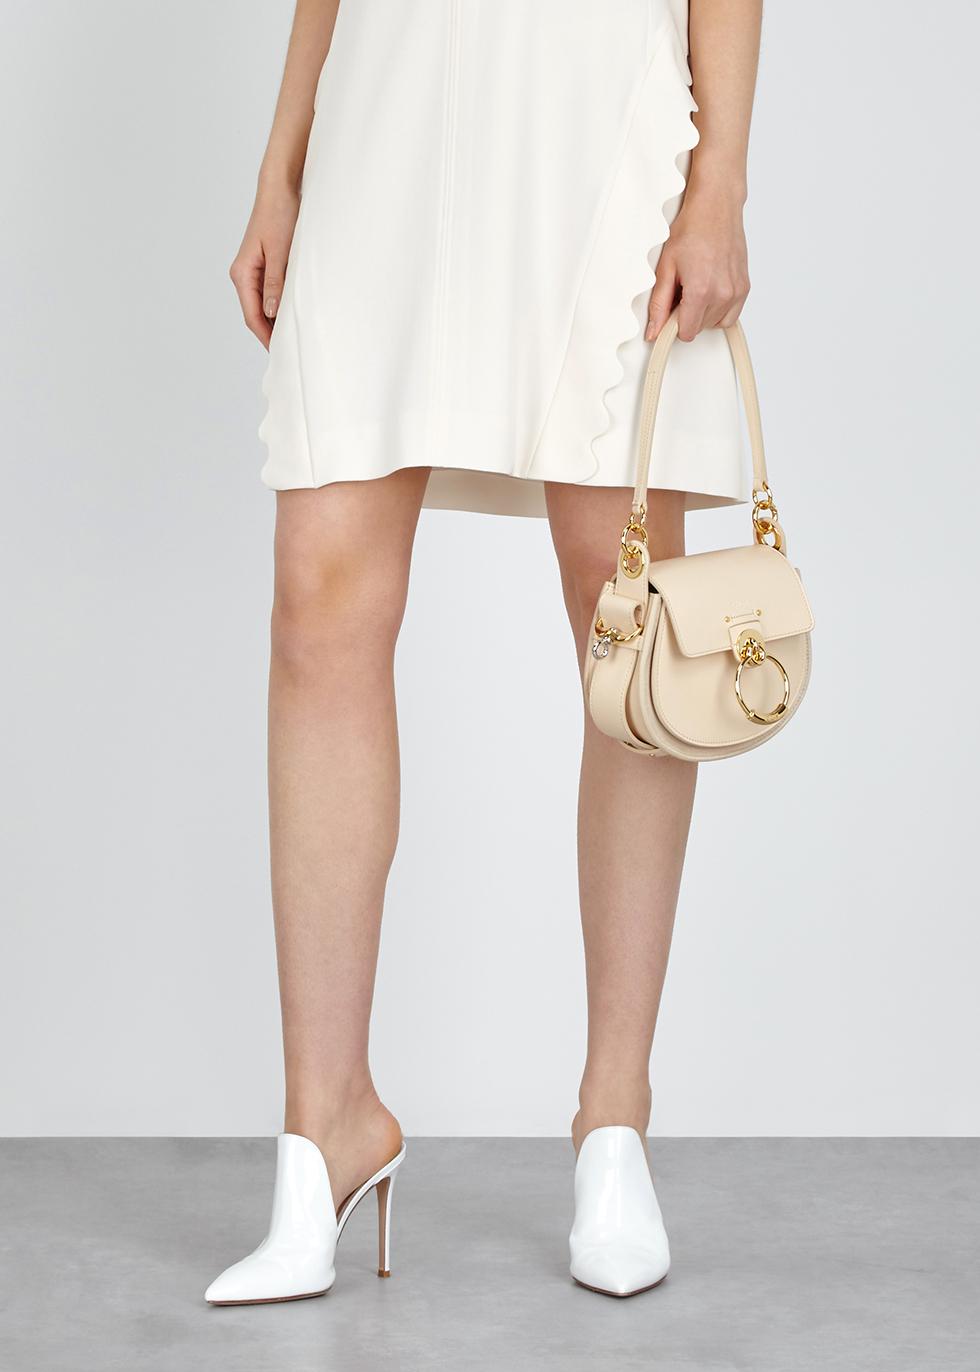 Tess small almond leather shoulder bag - Chloé